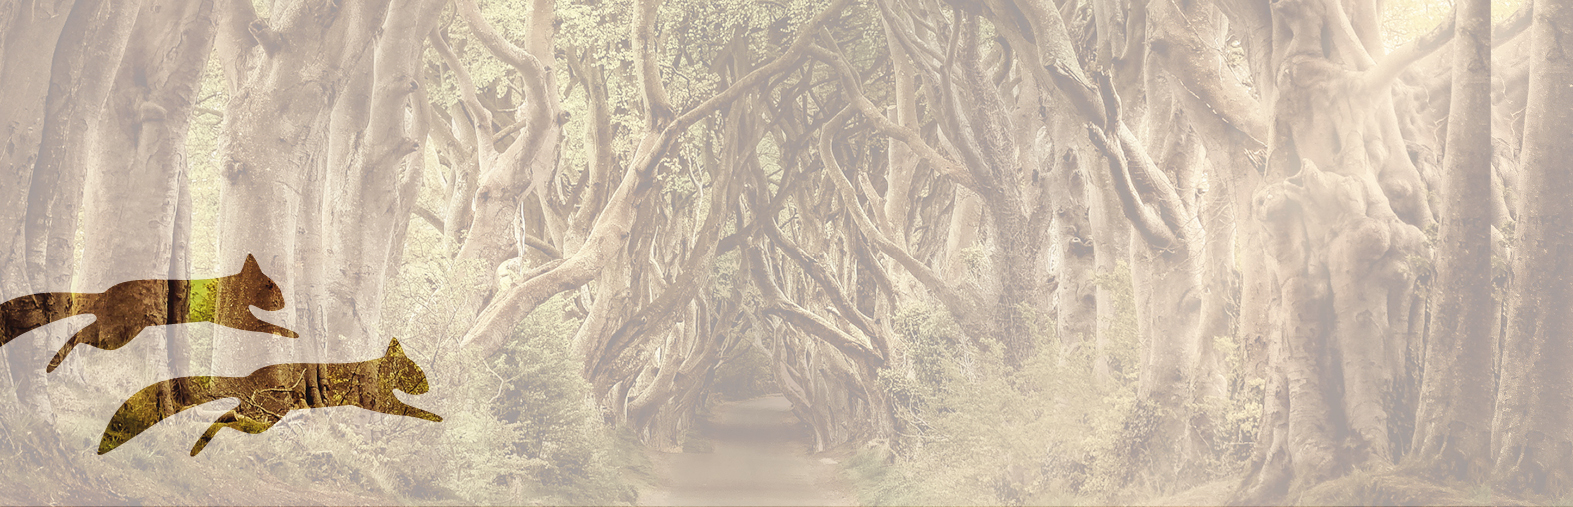 wildweksel – Kommunikation im Detail